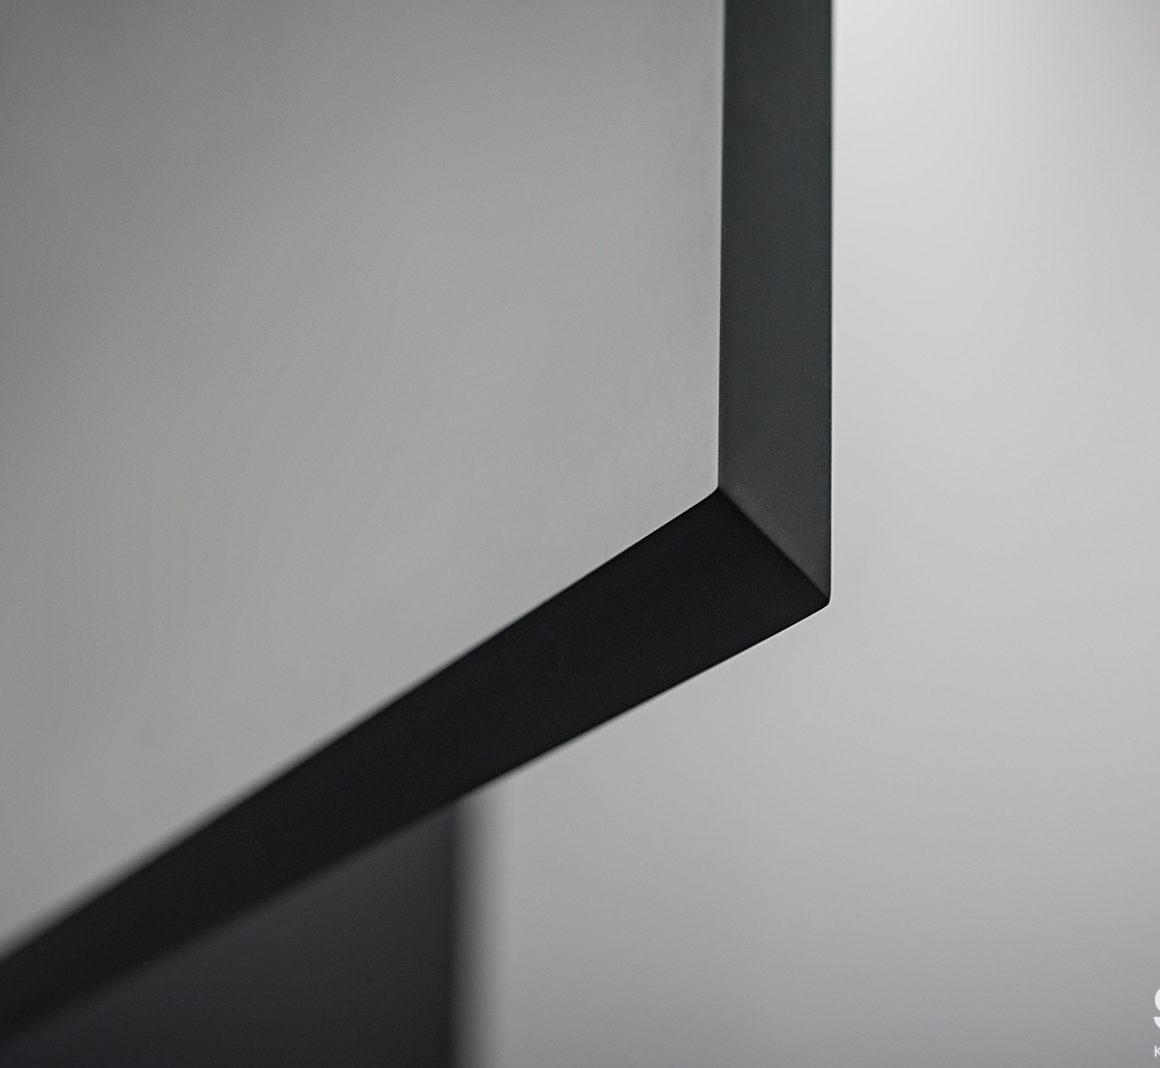 Интерьерная съемка мебели